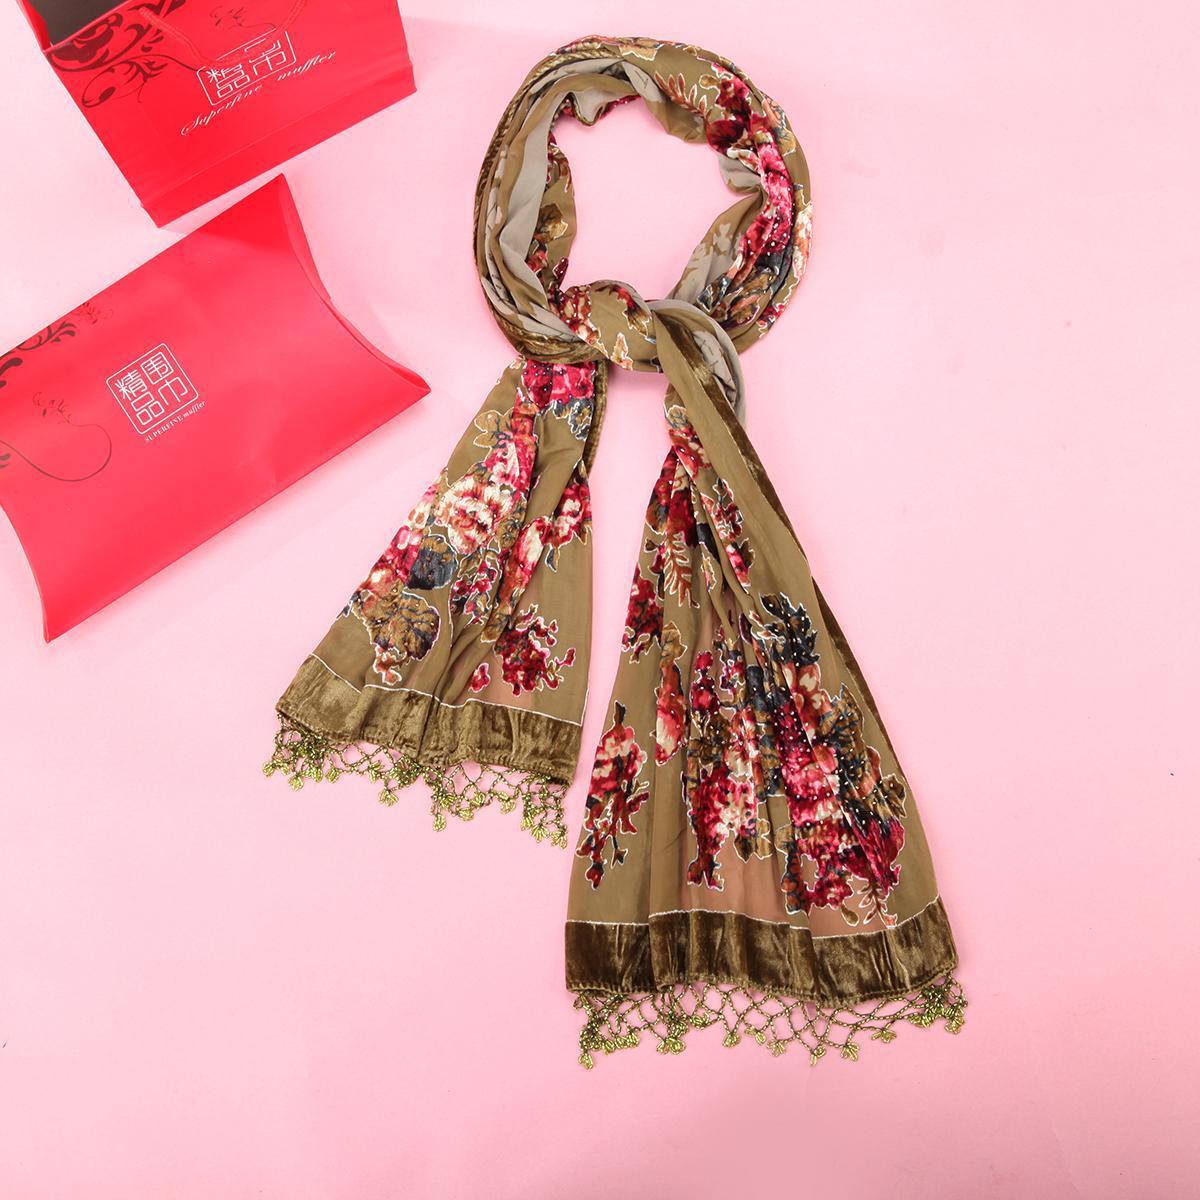 2019 New Vintage Flower   Scarves     Wrap   Women's Velvet Pashmina Printed Shawls Cape Handmade Beaded Muffler Hijab Kerchief Shawl